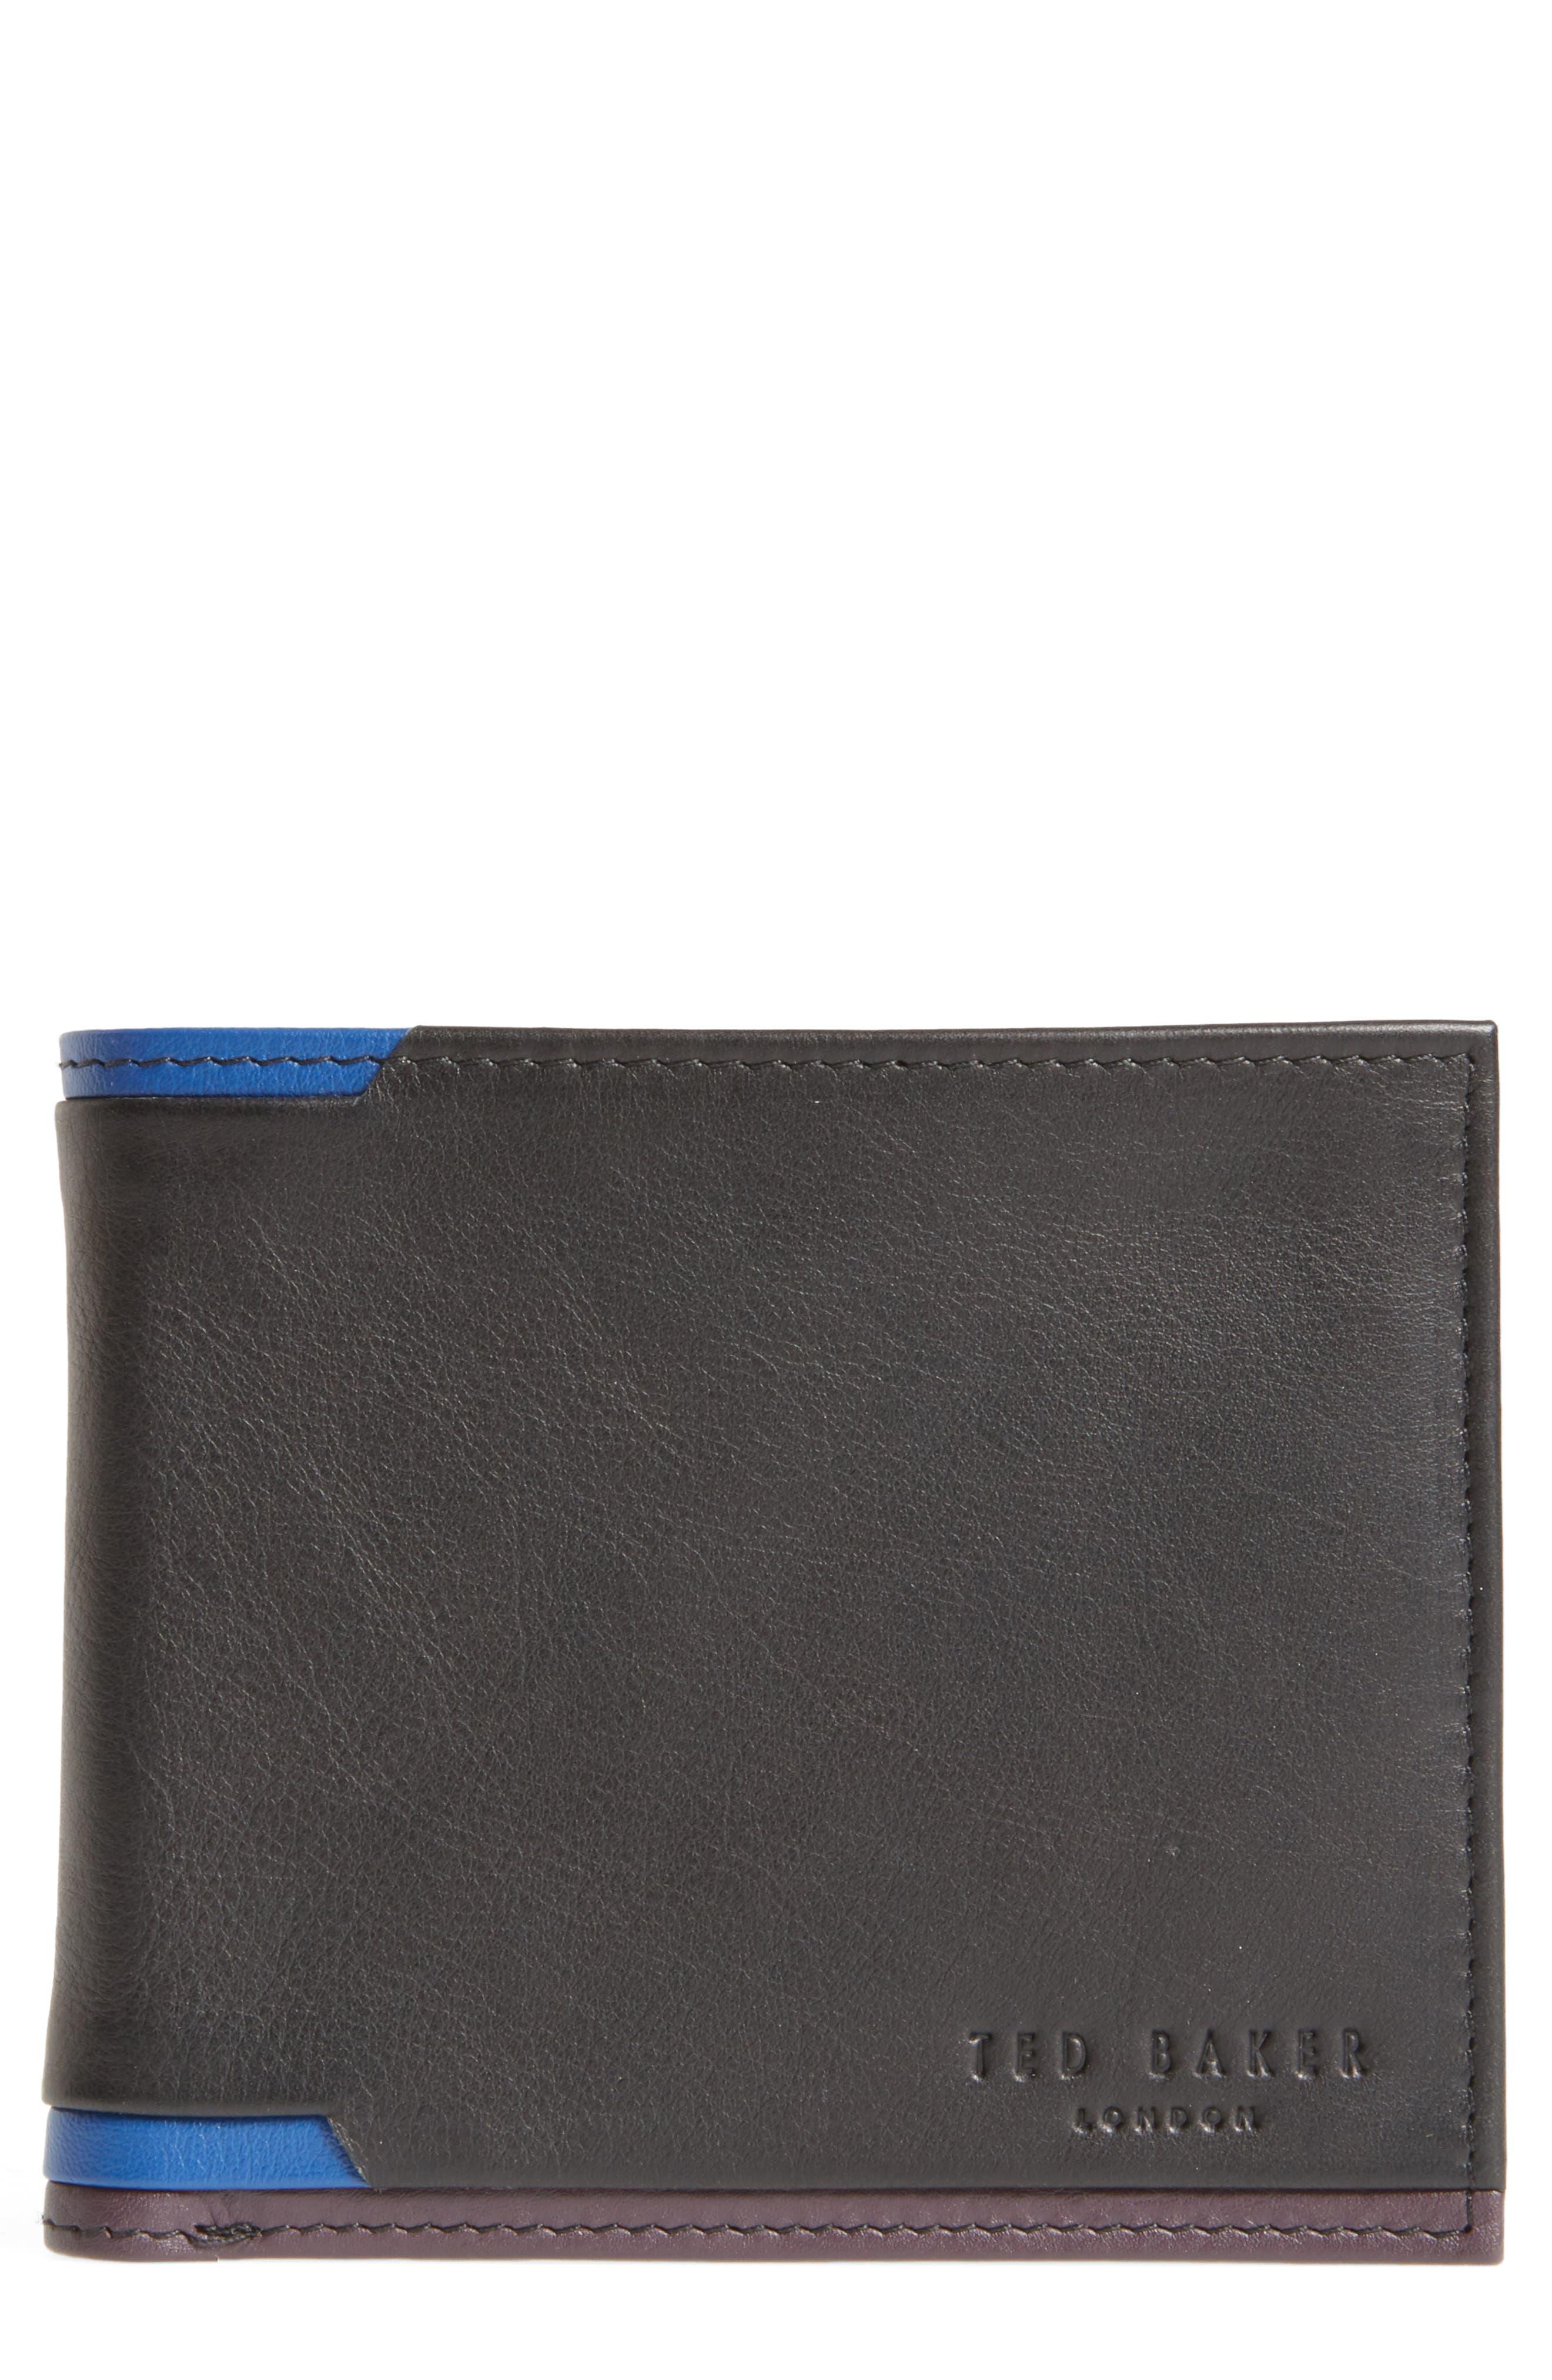 Baldi Corner Detail Leather Wallet,                             Main thumbnail 1, color,                             Black